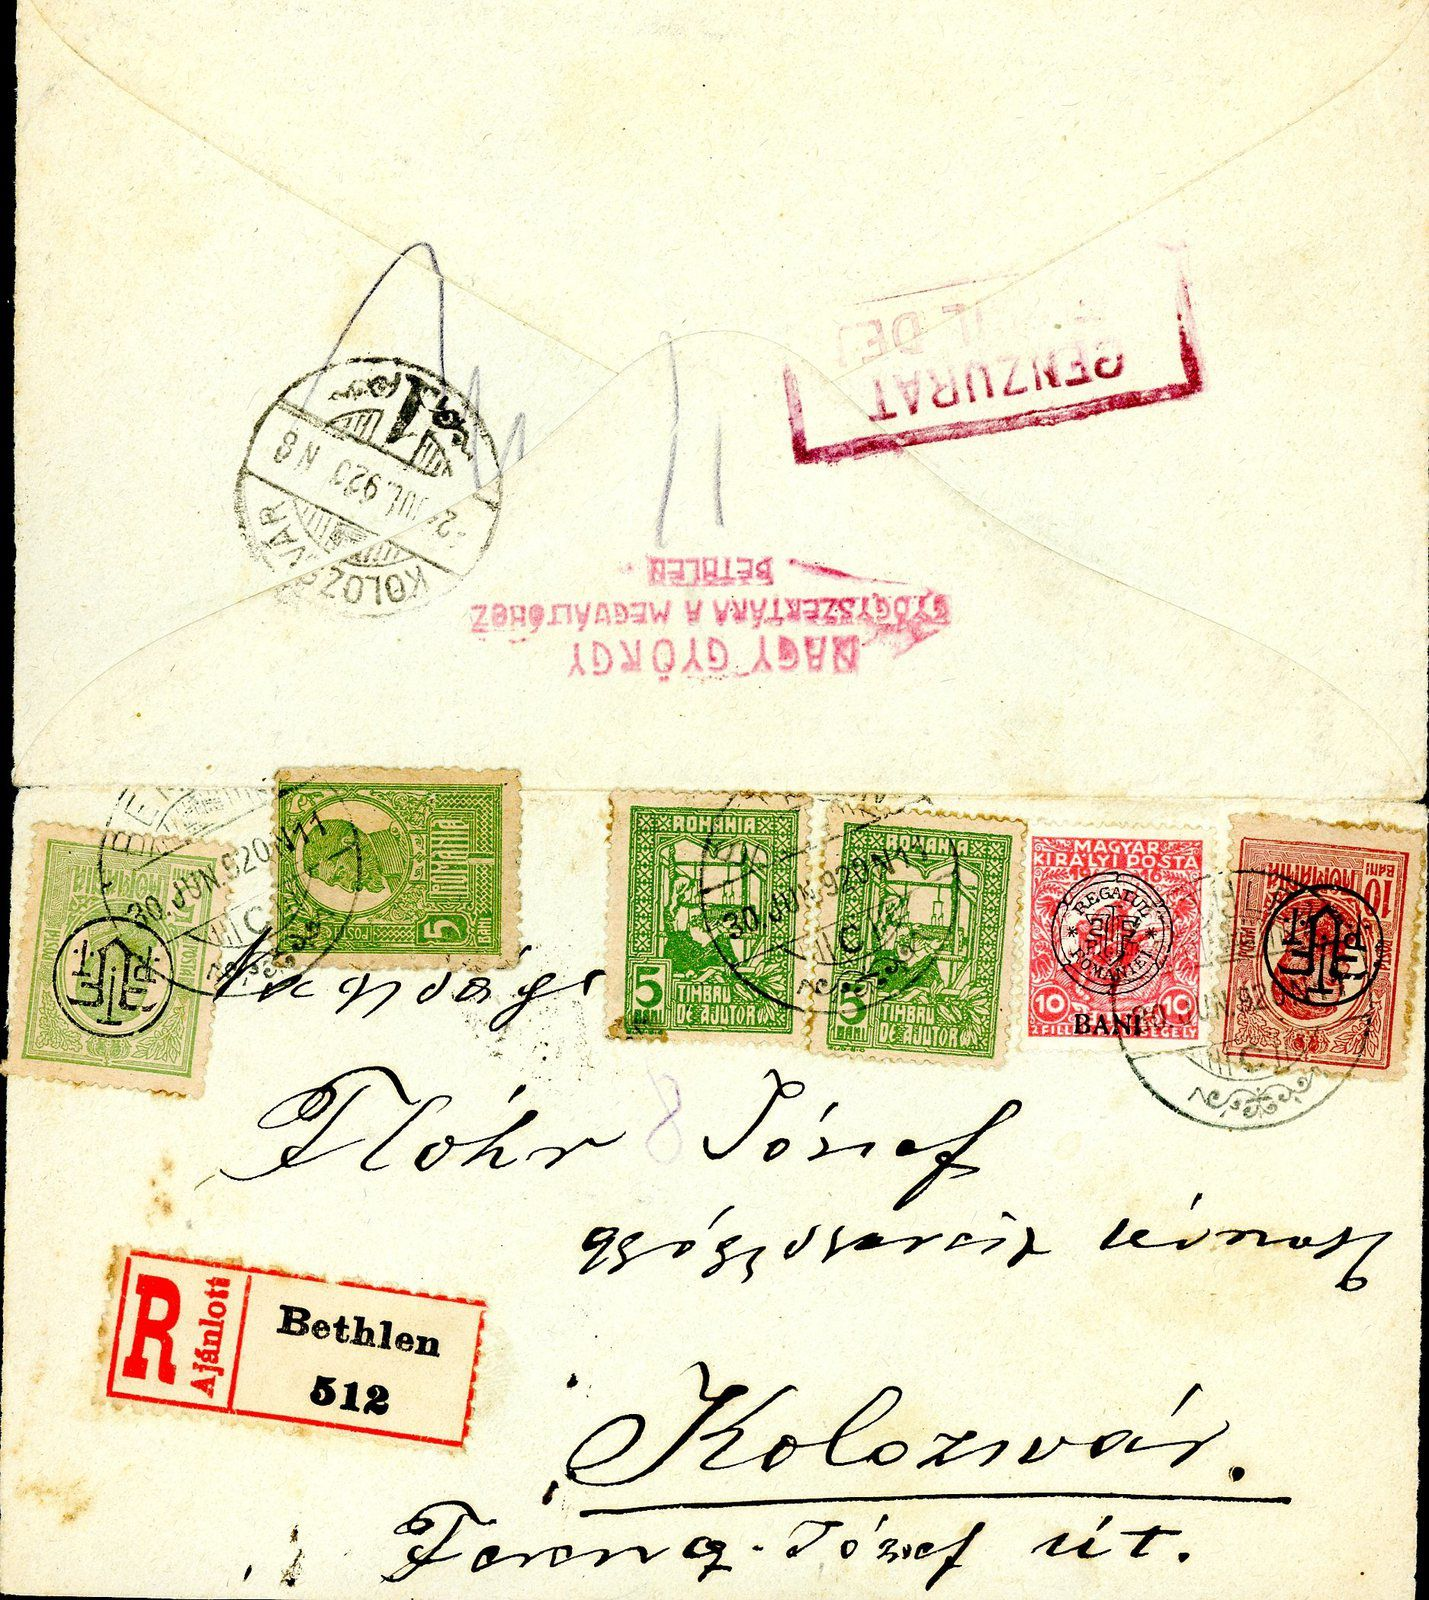 Fig.13: Billet de banque hongrois de 10 Korona avec le cachet roumain ROMANIA TMBRU SPECIAL. Fig.14: Enveloppe recommandée de Cluj (Kolozsvár) à Prundu Bârgăului (Borgóprund) du 04.09.1919. CAD hongrois, timbre hongrois avec surcharge roumaine de Cluj, cachet roumain de censure. Fig.16: Carte postale d'Ocna Sibiului (Vizakna) à Berlin du 27.10.1919. CAD hongrois, timbres hongrois avec surcharge roumaine de Cluj, cachet roumain de censure. Fig.18: Carte postale de Timișoara (Temesvár) à Ploiești du 21.11.1919, CAD hongrois, timbre hongrois surchargé à Cluj et timbre roumain, cachet de censure roumain.